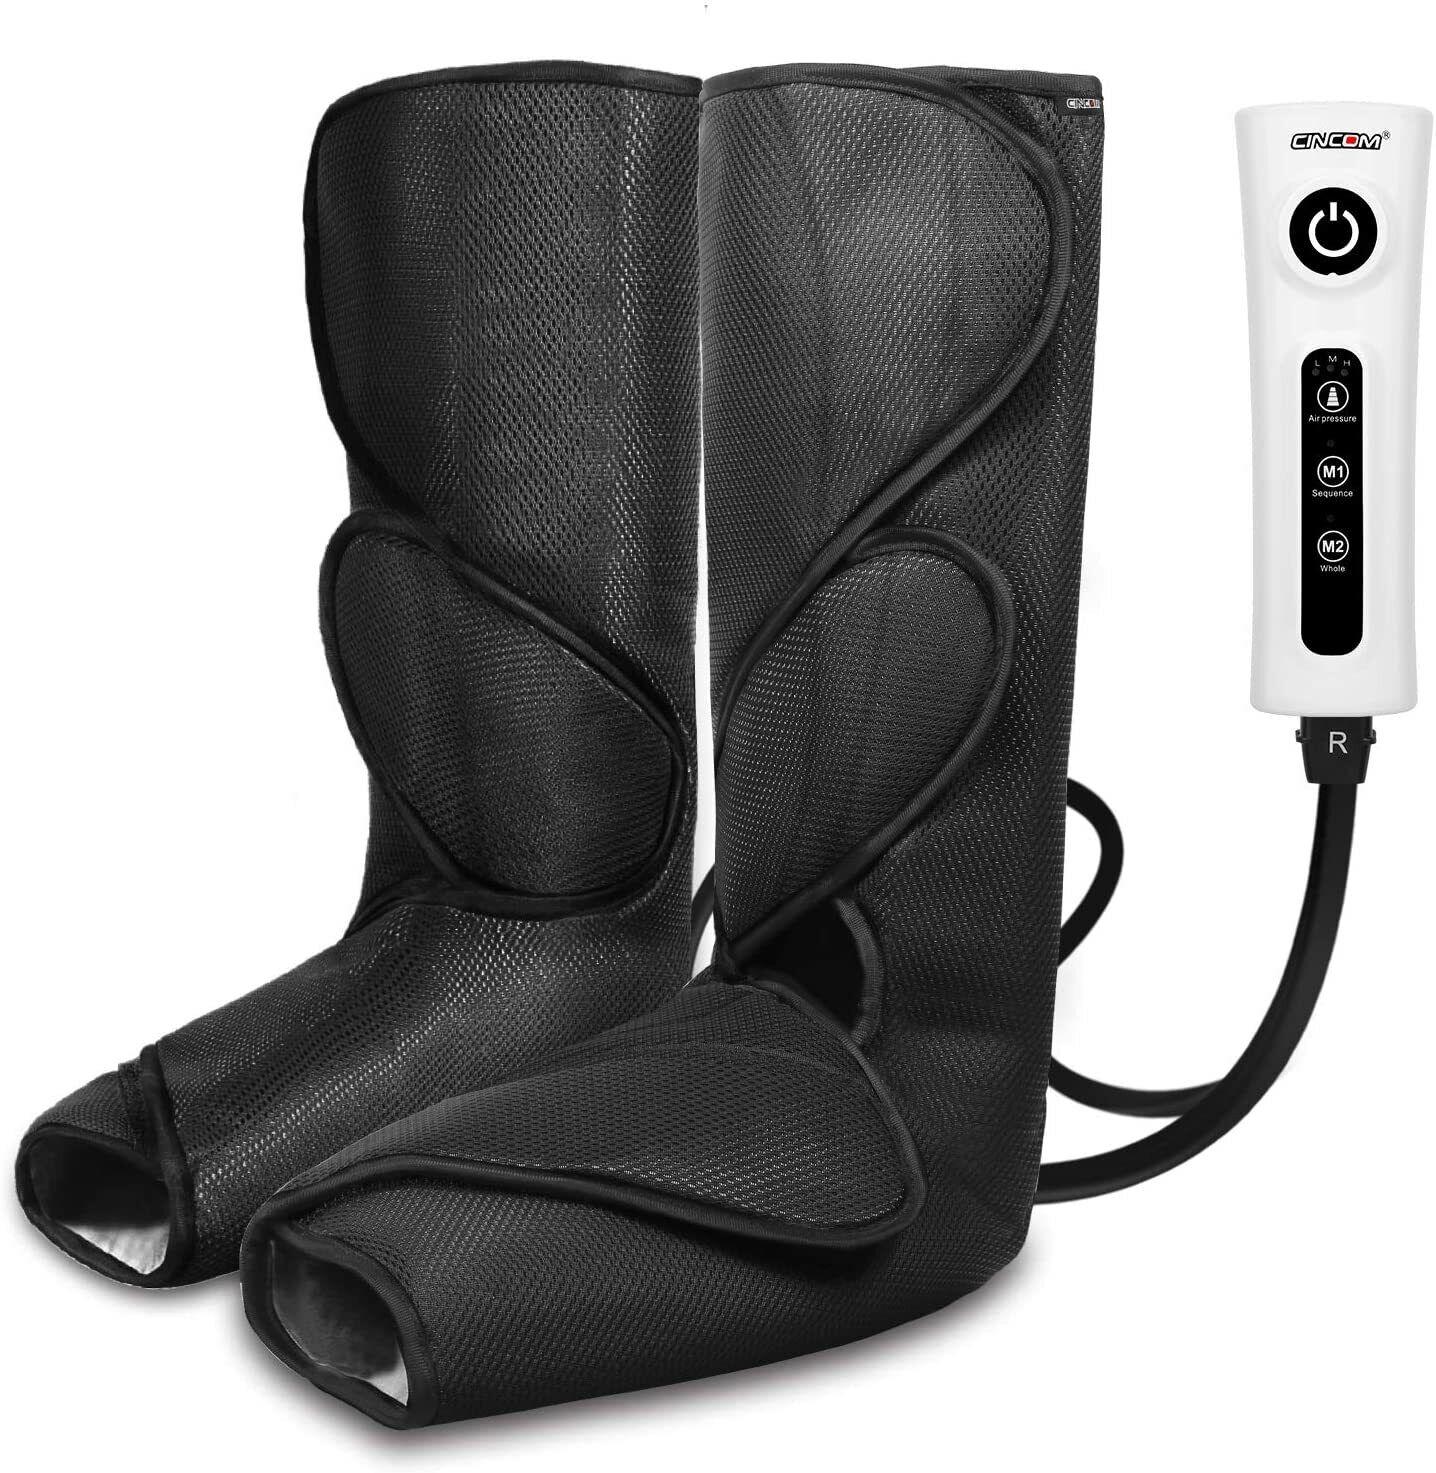 CINCOM Leg Massager for Foot Calf Air Compression Leg Wraps